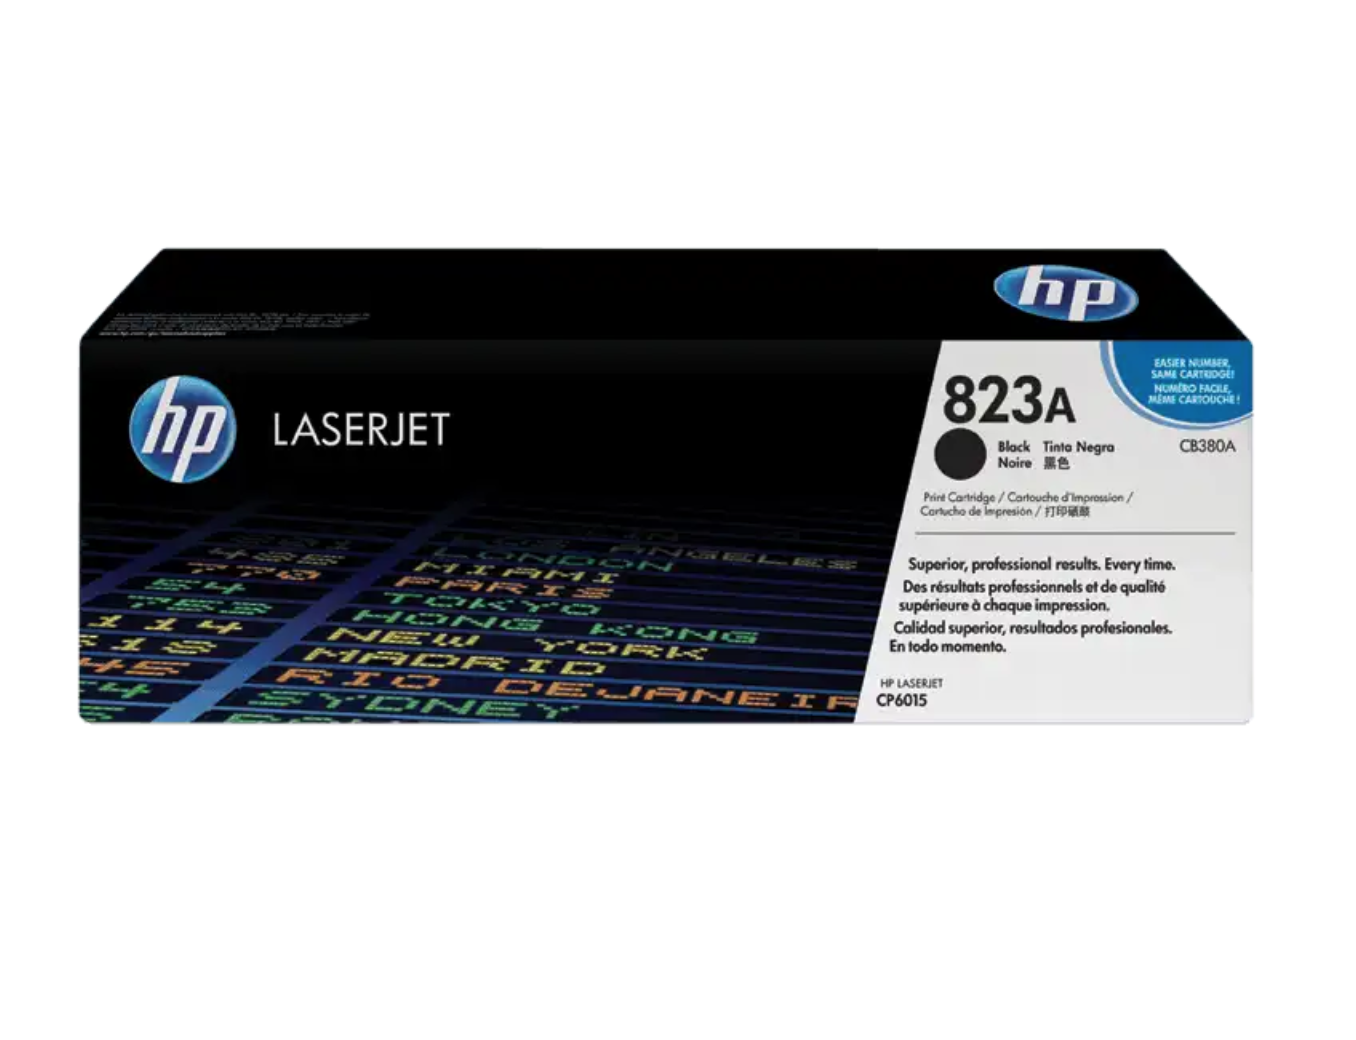 HP 823A 黑色原廠 LaserJet 碳粉 CB380A